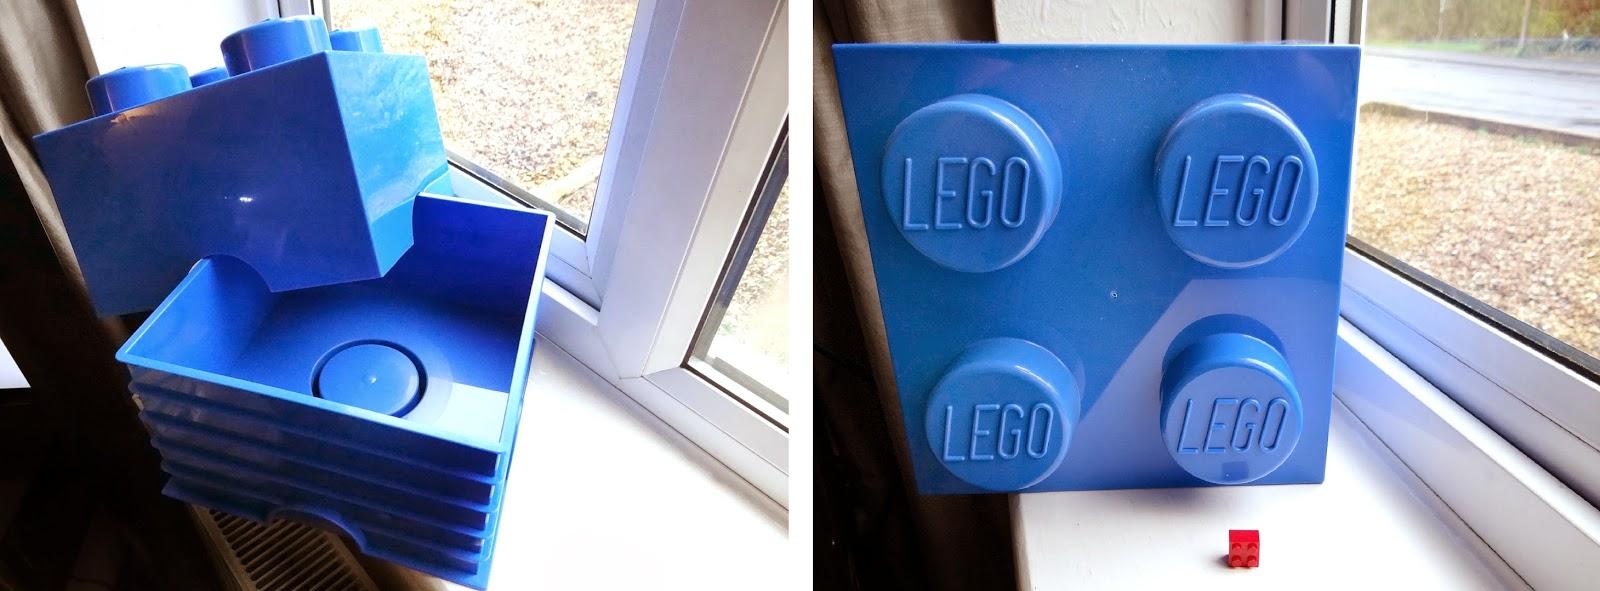 LEGO Storage Bricks, Limited Edition LEGO Storage, Giant LEGO Bricks